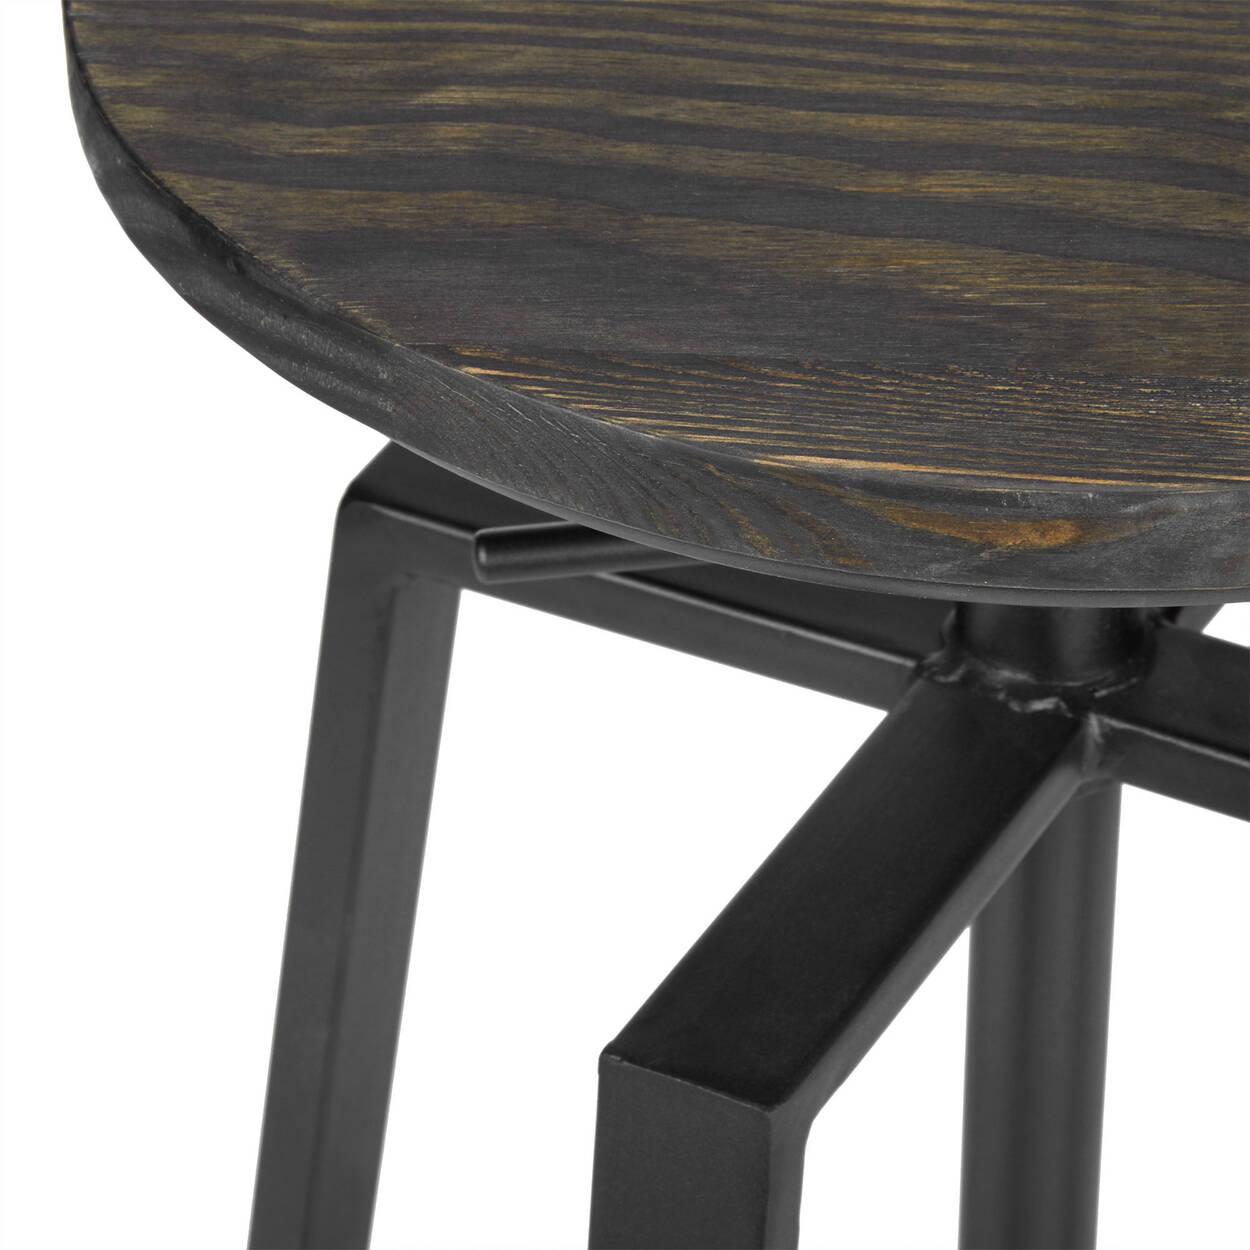 Tabouret de bar ajustable en bois d 39 orme et en m tal for Tabouret bar ajustable